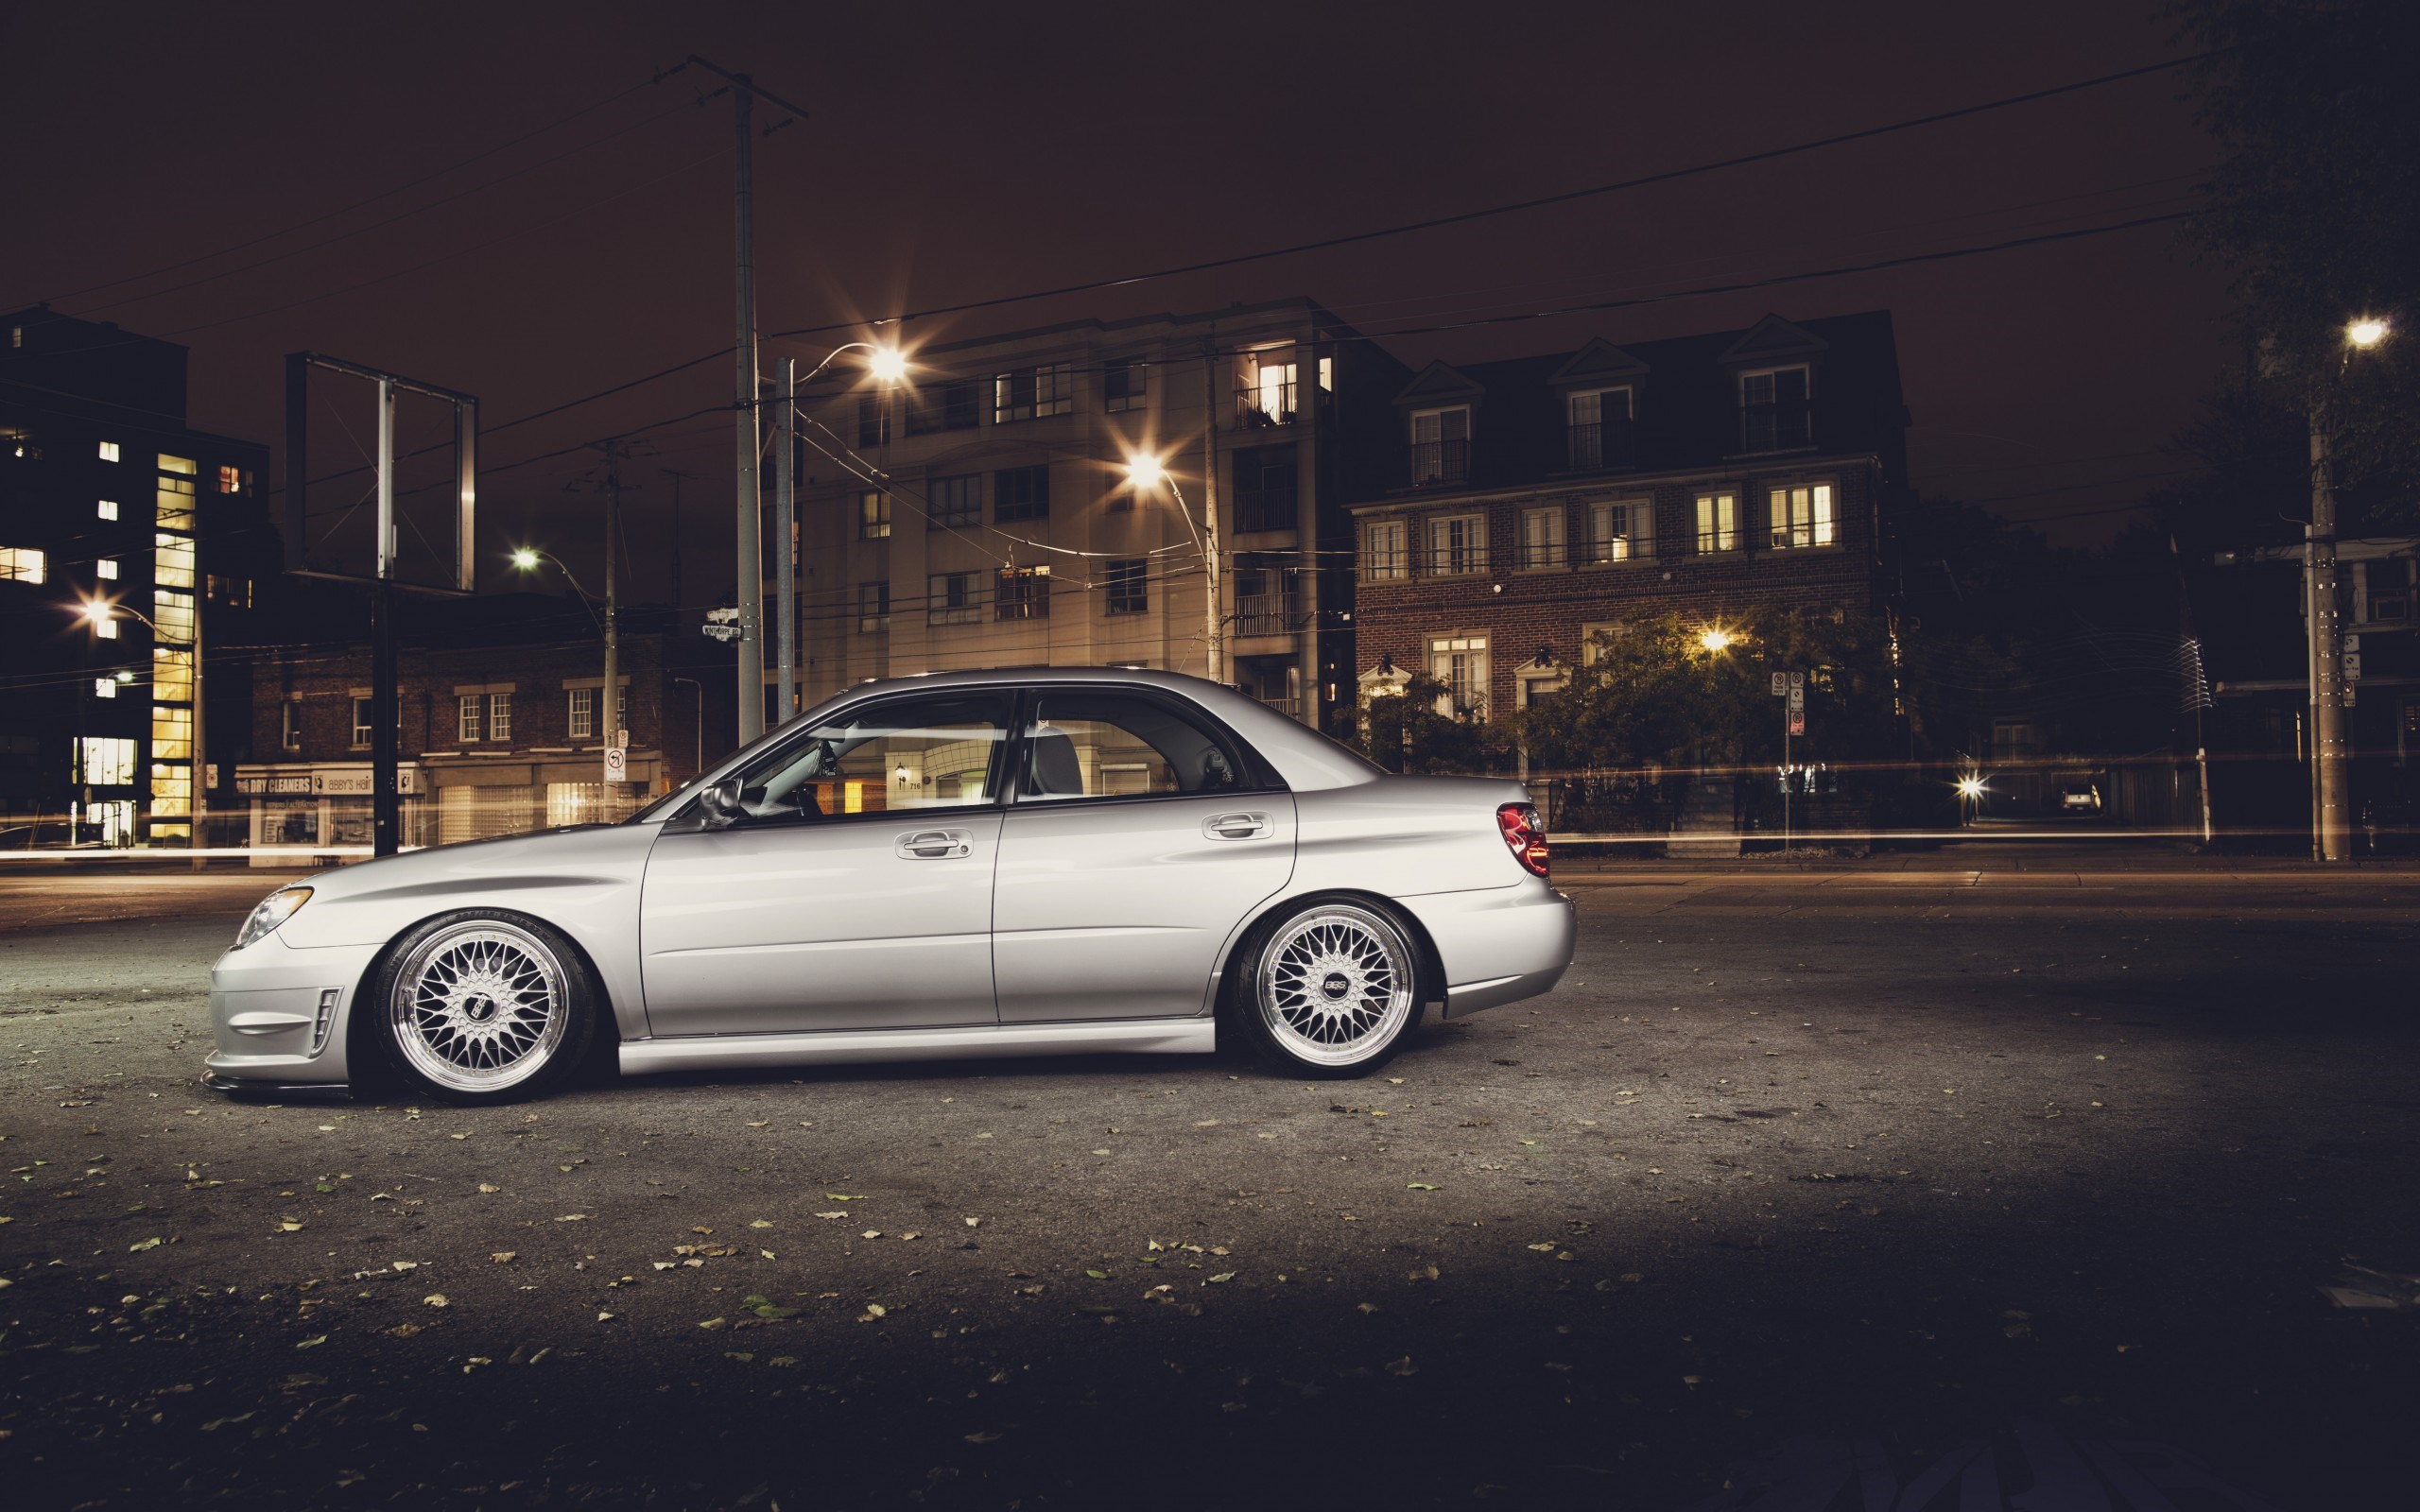 Subaru Impreza City Parking